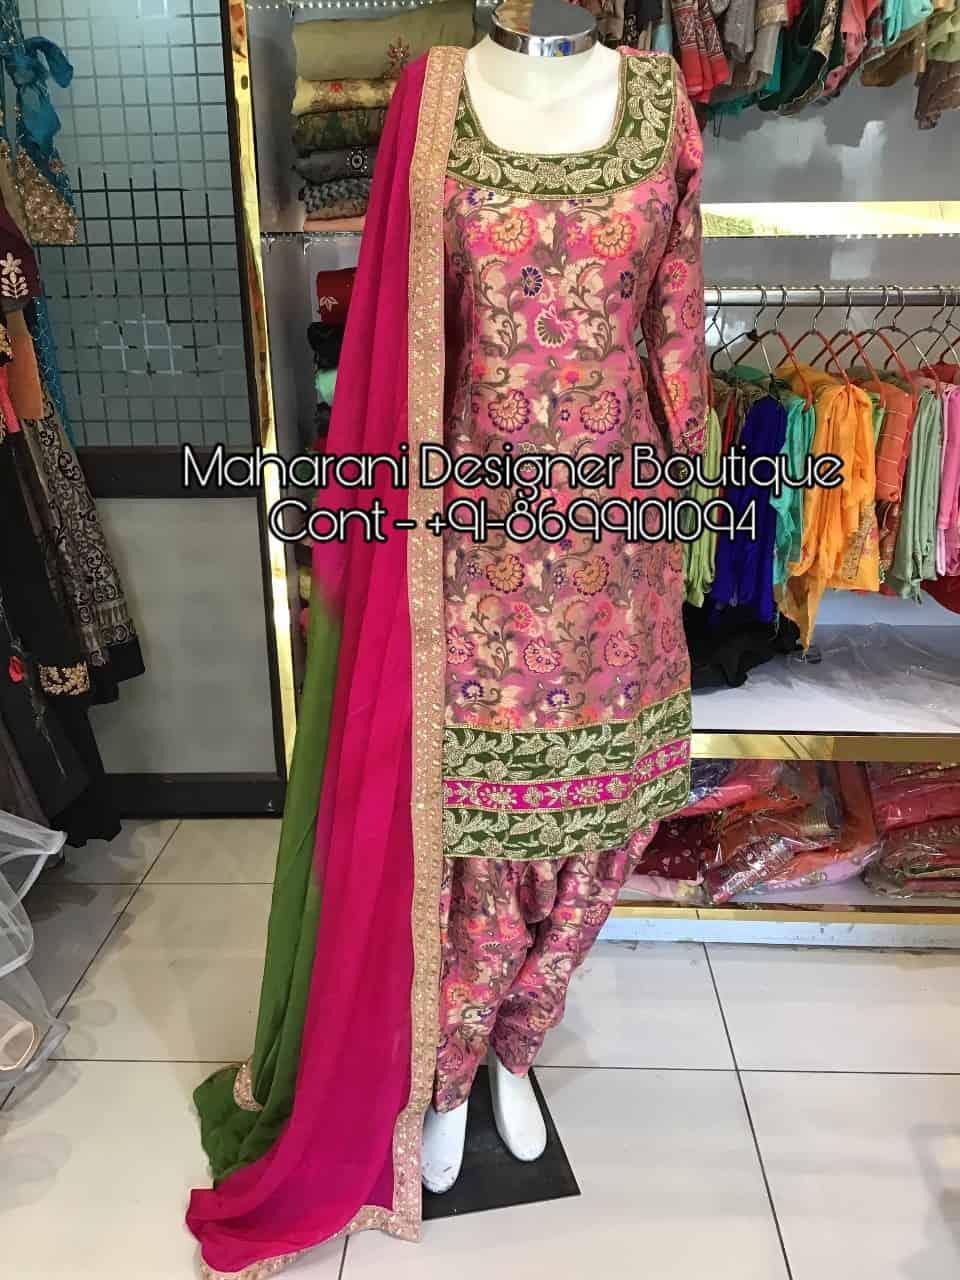 Punjabi Suit Boutique On Facebook In Khanna Maharani